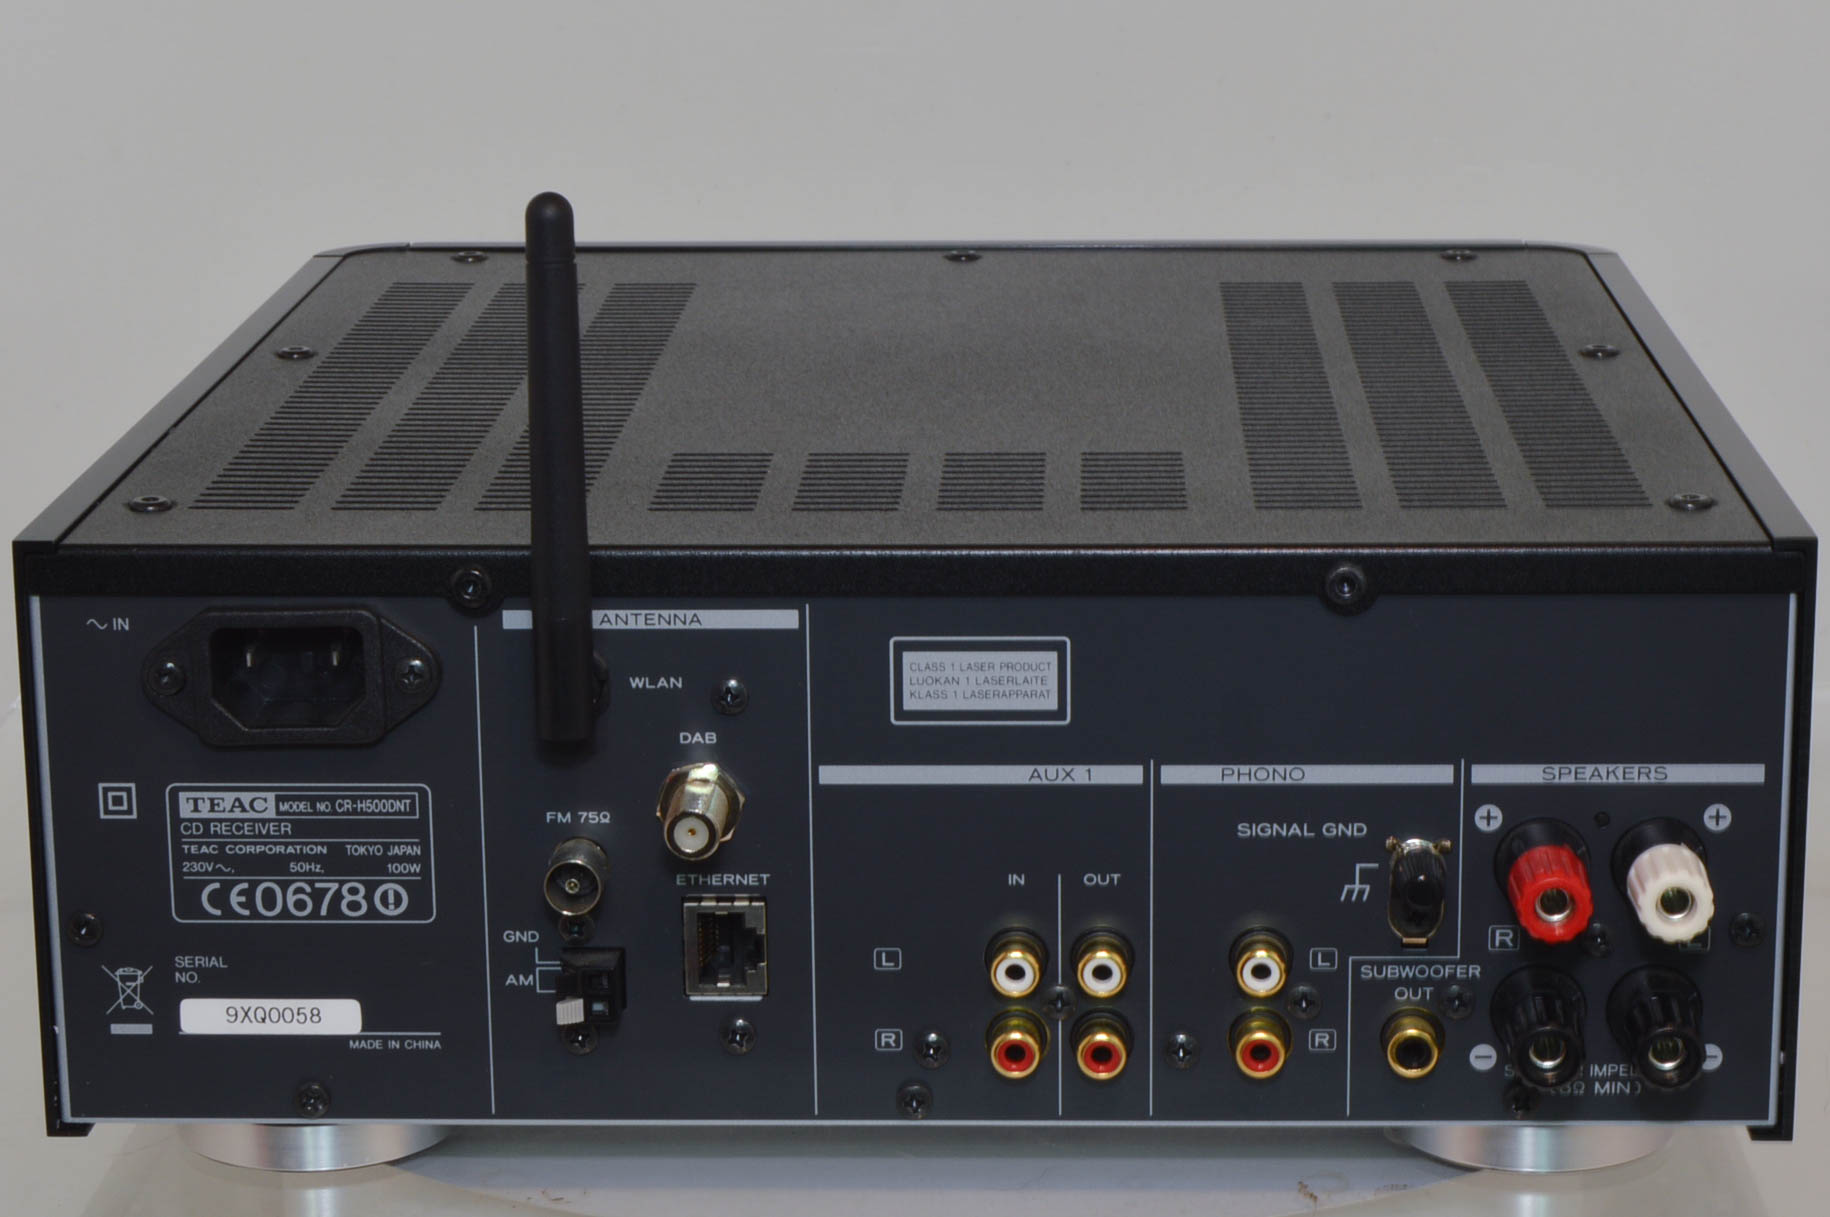 Teac CR-H500DNT-B Network CD Receiver System | 2ndhandhifi ...